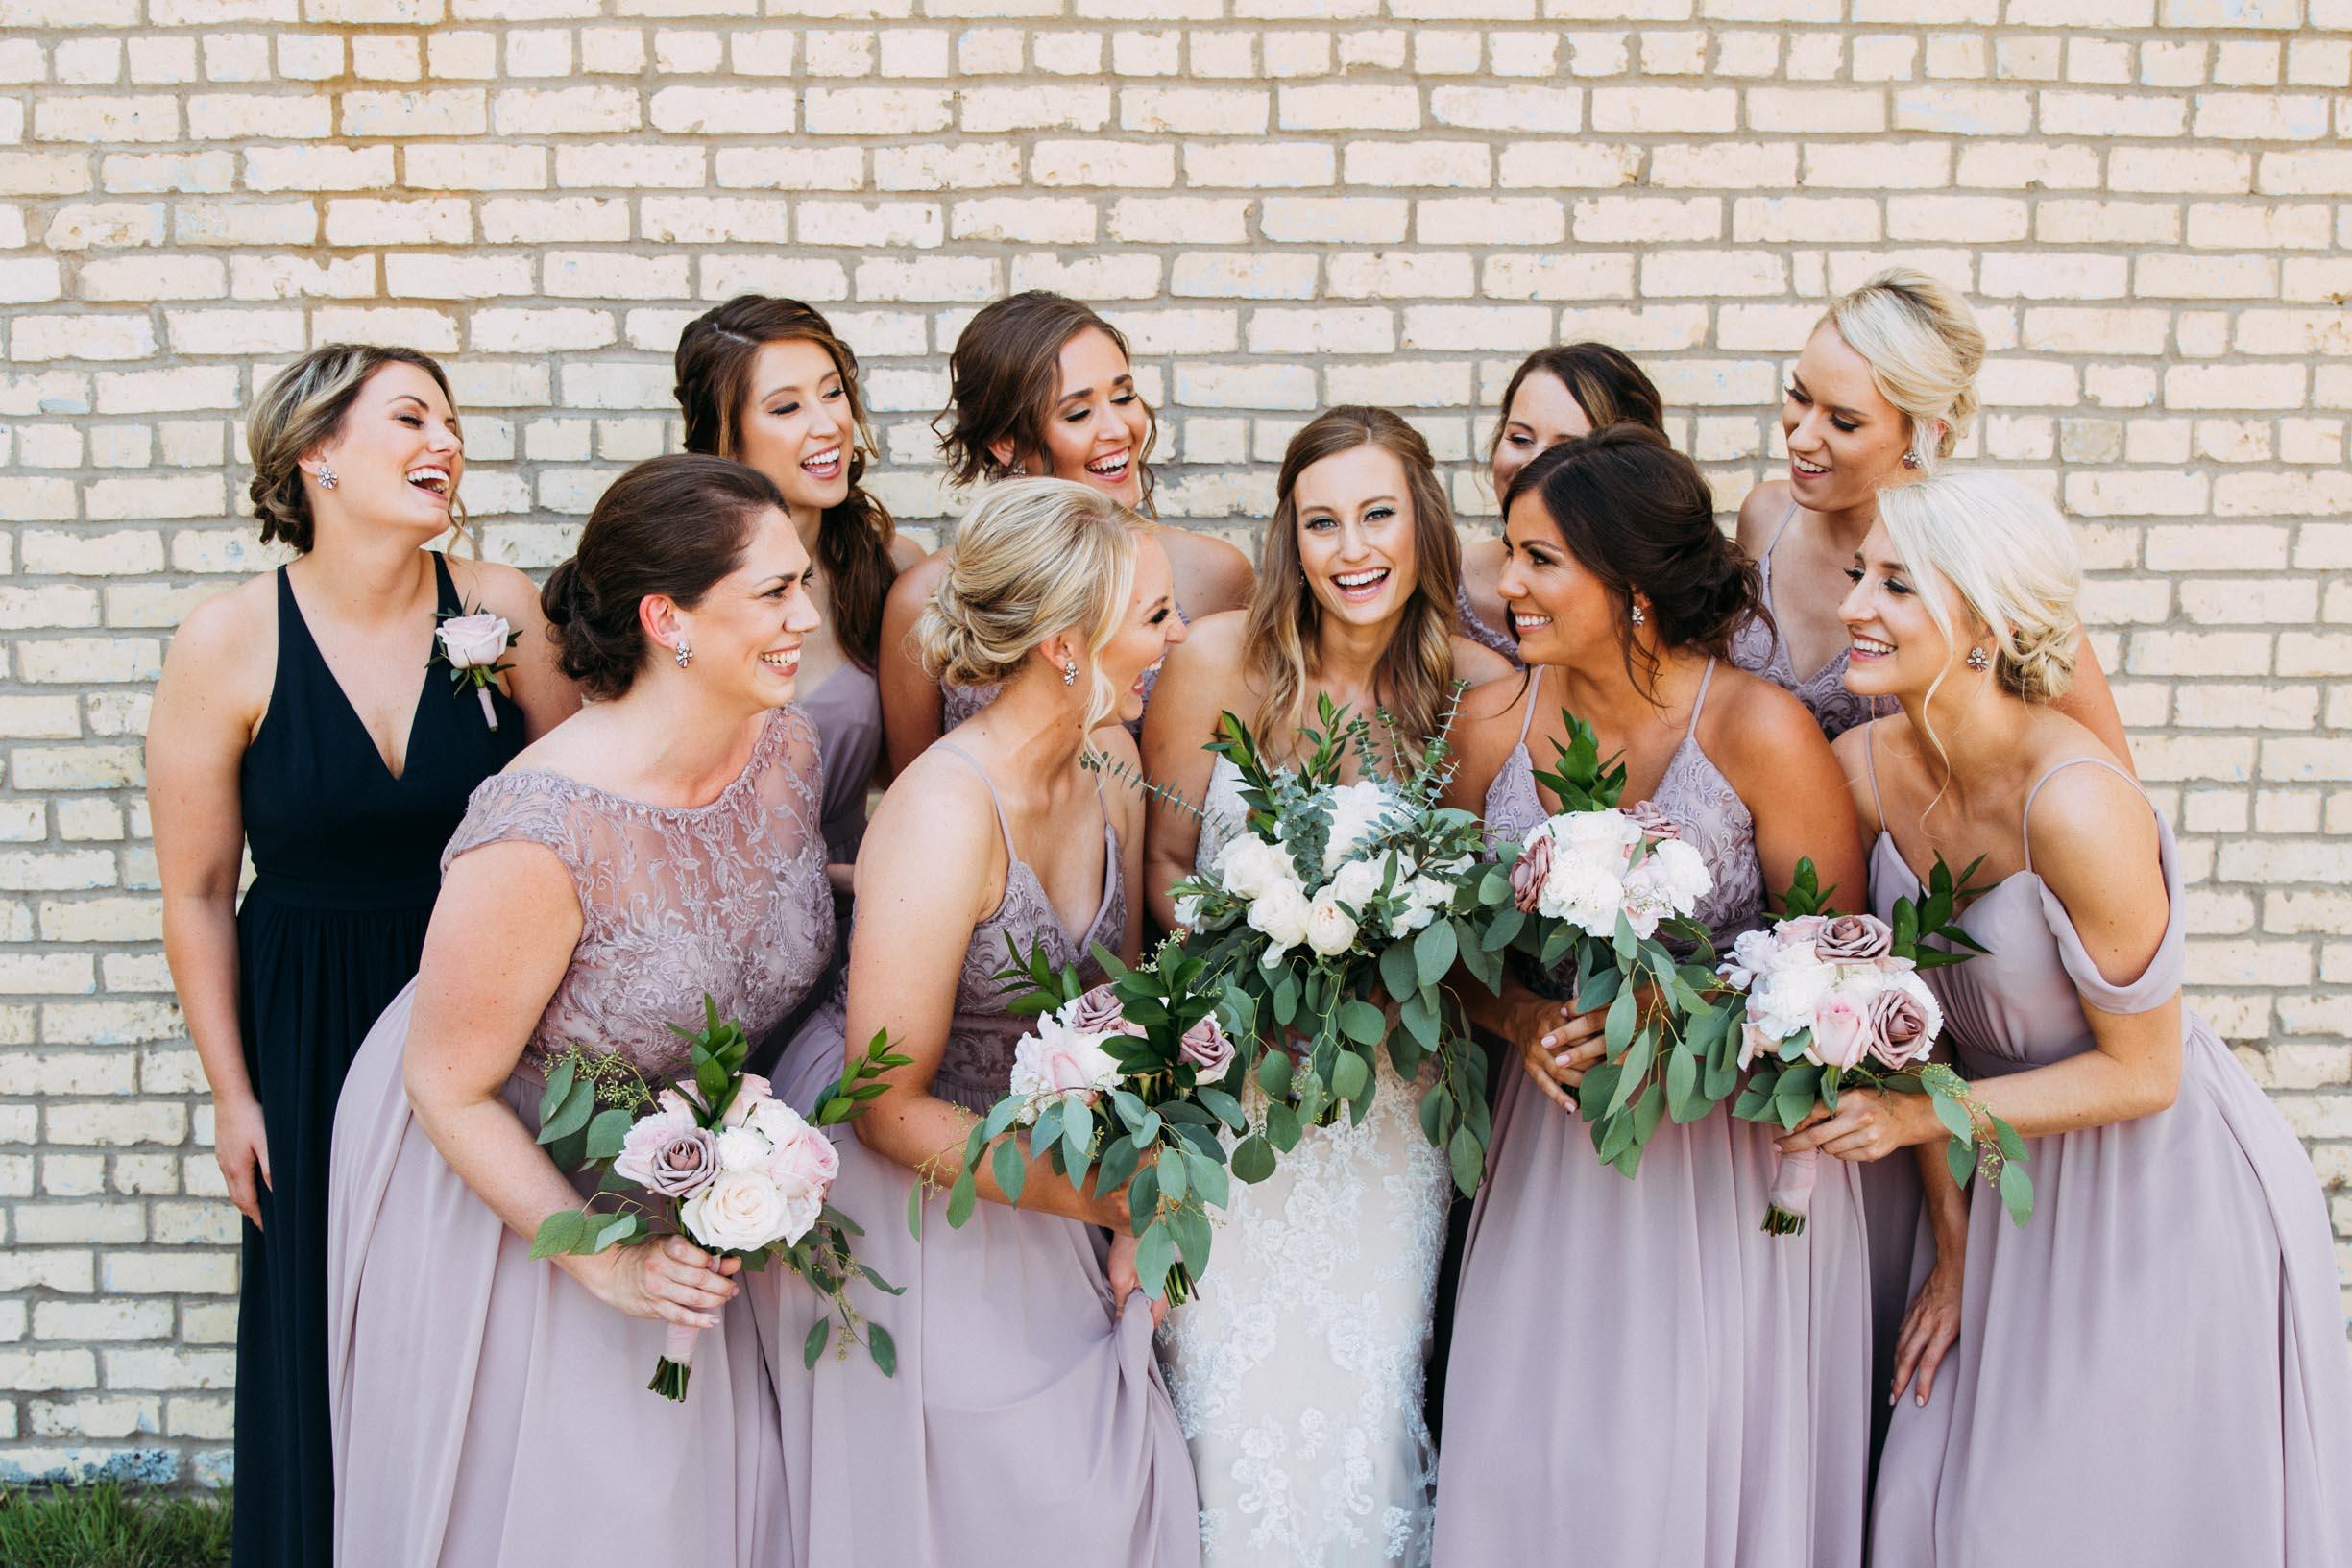 41-WeddingsattheBroz_Minnesota_WeddingBlog_WeddingParty.jpg